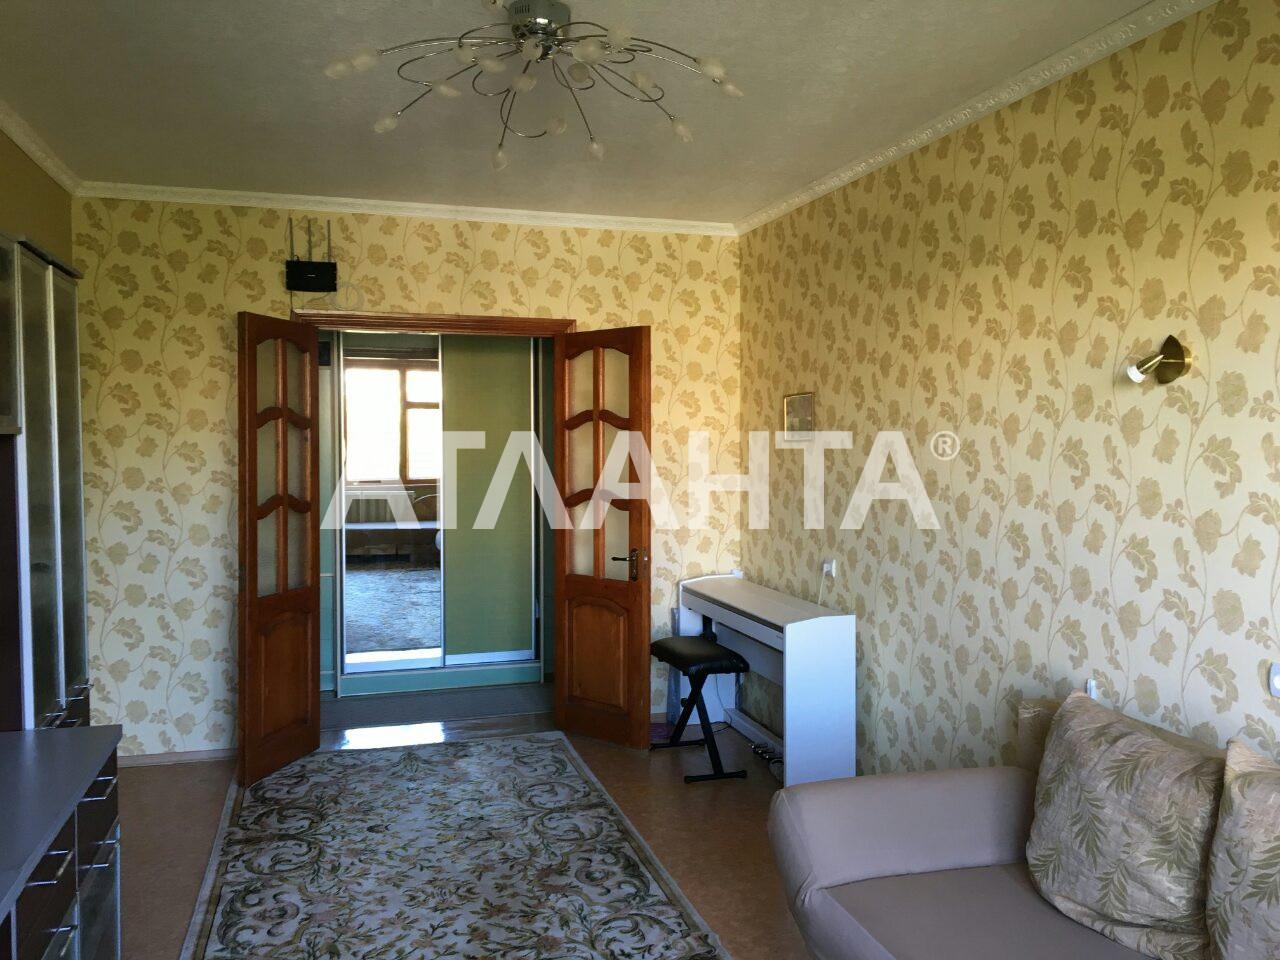 Продается 3-комнатная Квартира на ул. Архитекторская — 49 000 у.е. (фото №2)